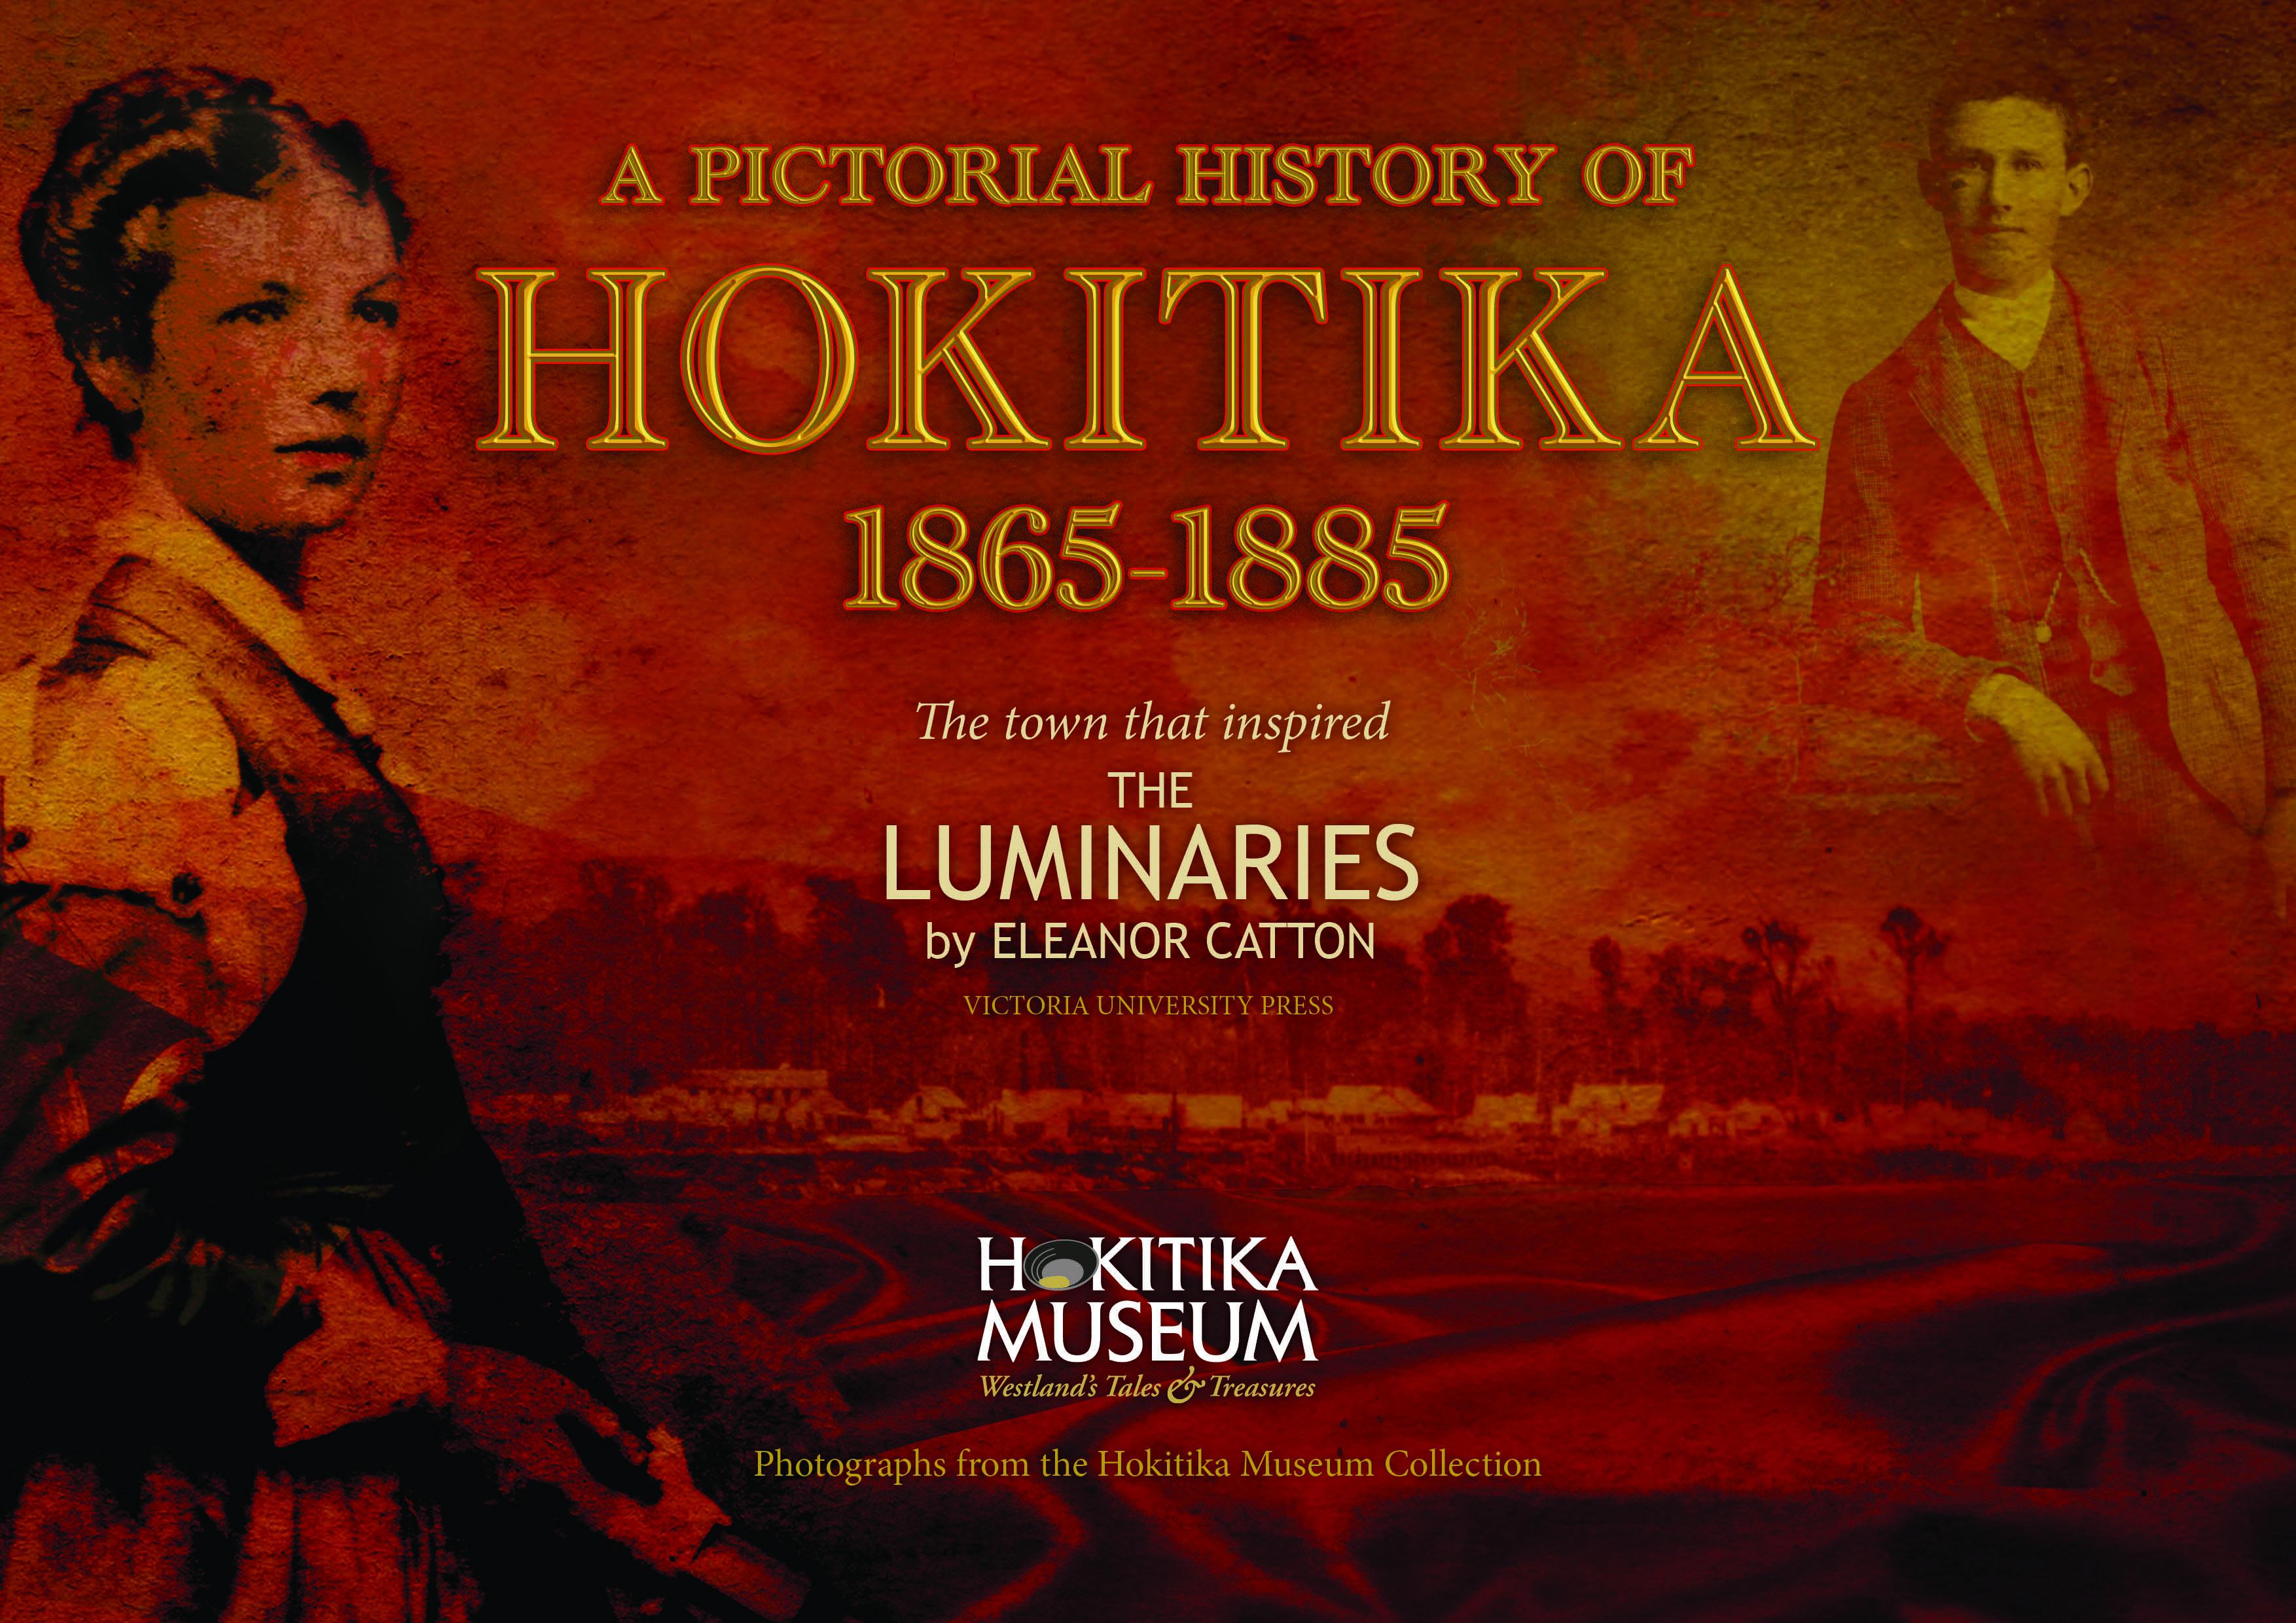 Hokitika Pictorial